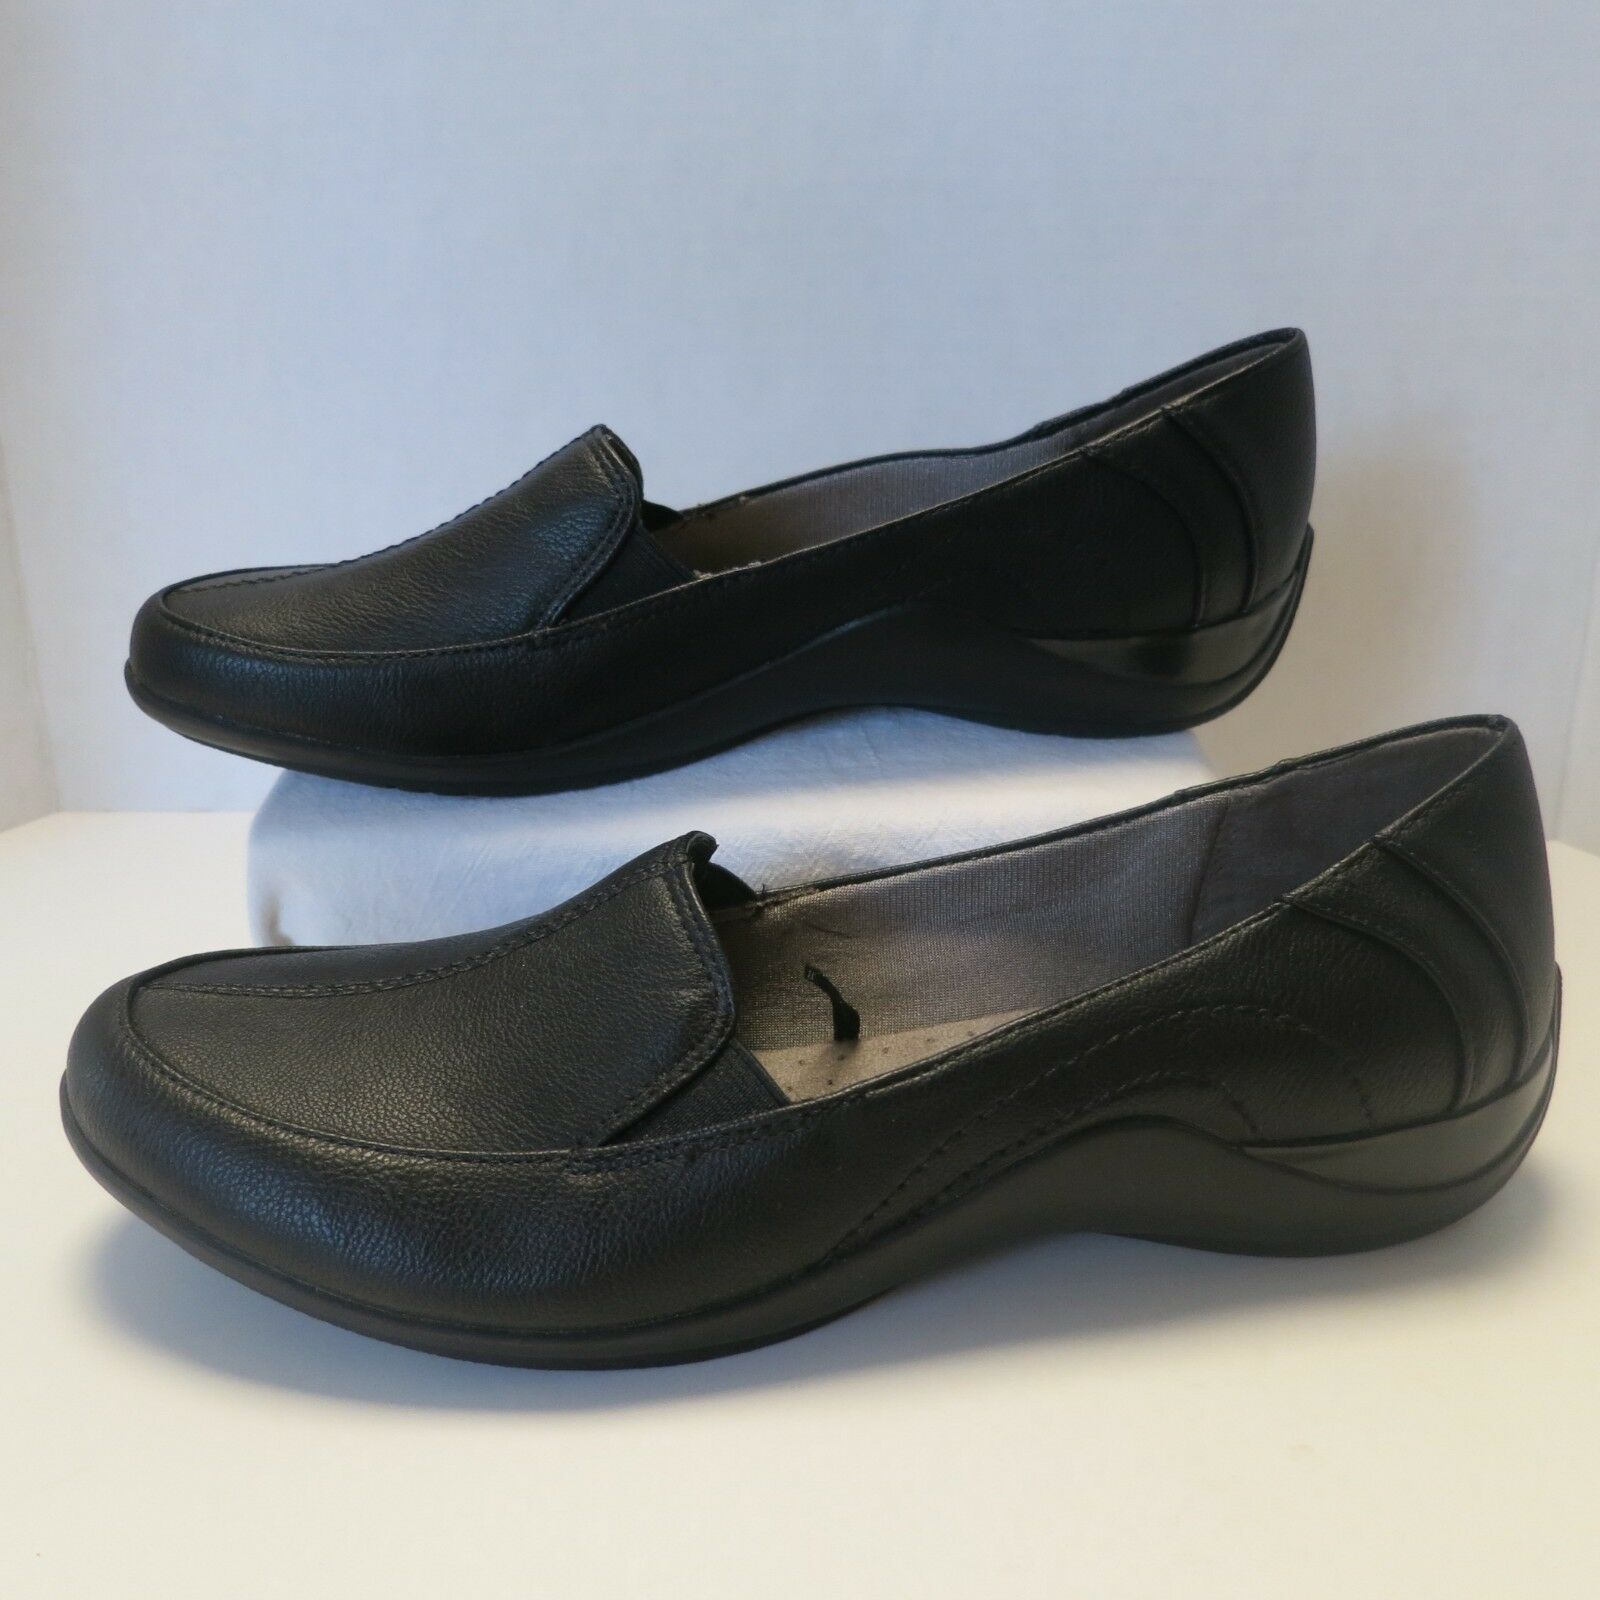 LifeStride Loafer Mada Black Bomber PU 9 Wide Women's Flats